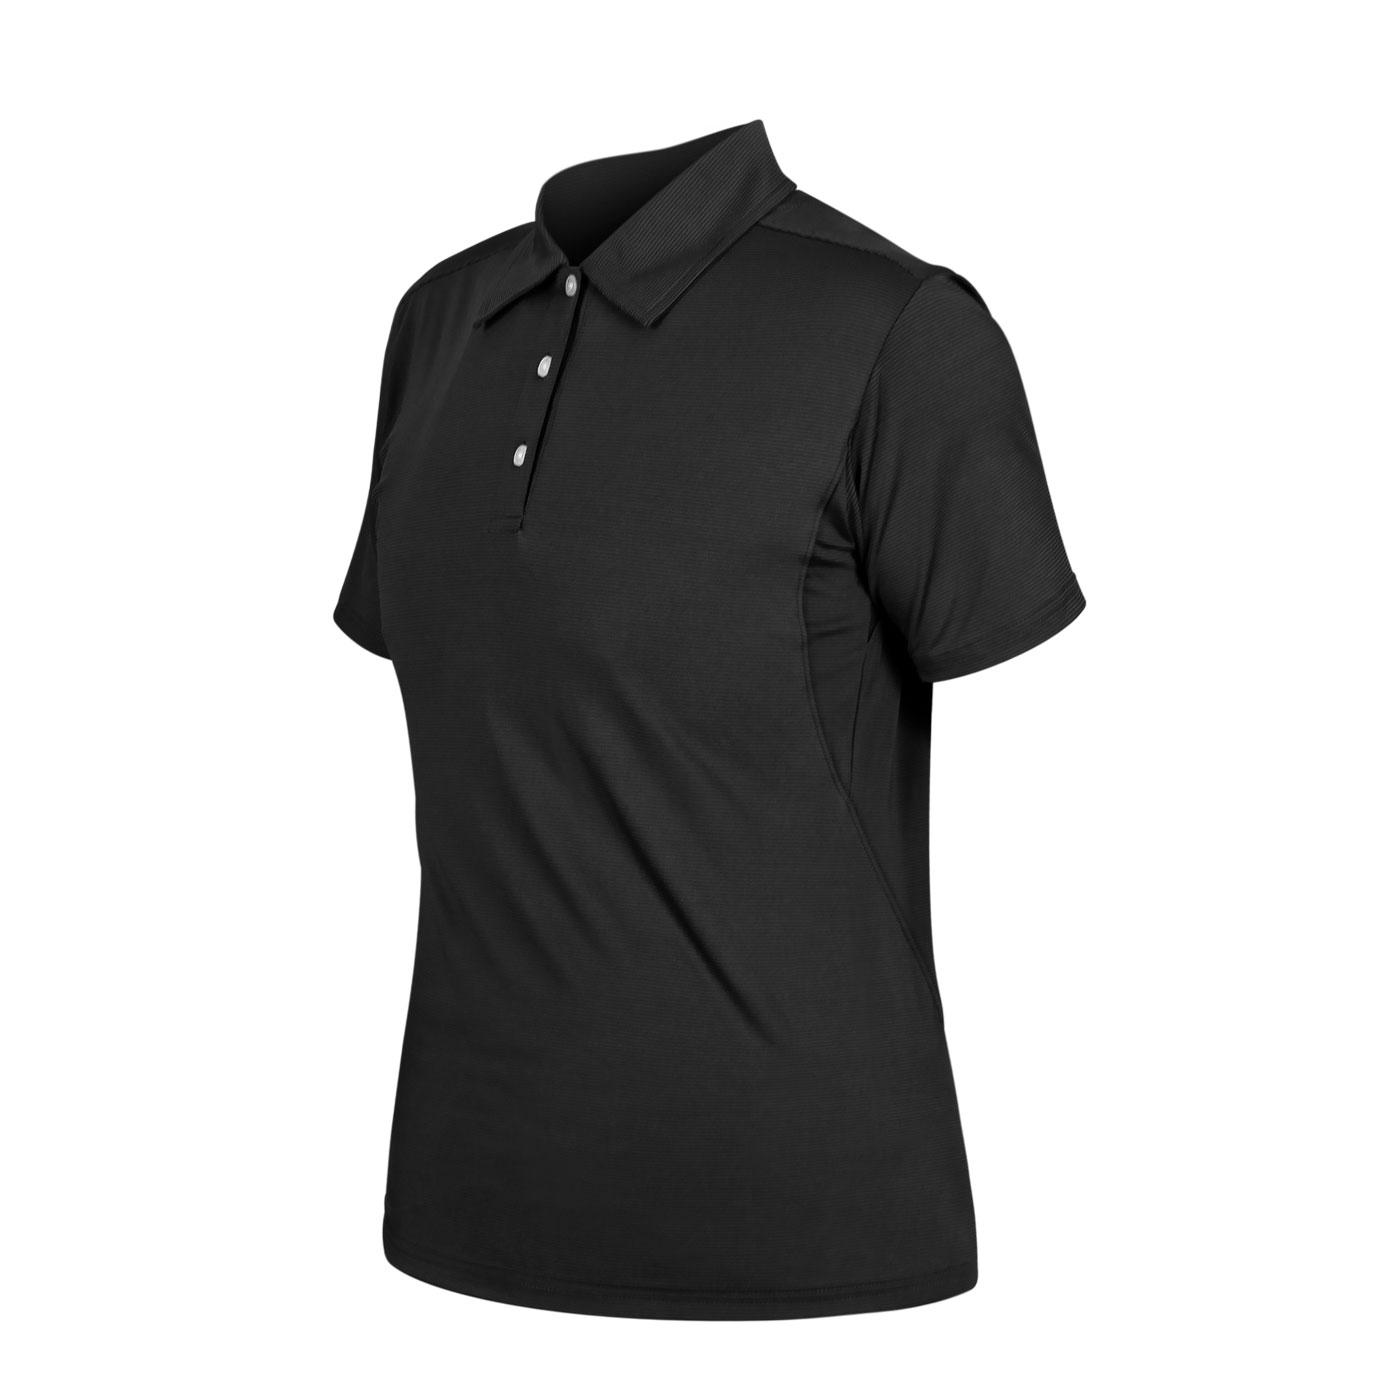 HODARLA 星魁剪接短袖POLO衫 3162101 - 黑條紋